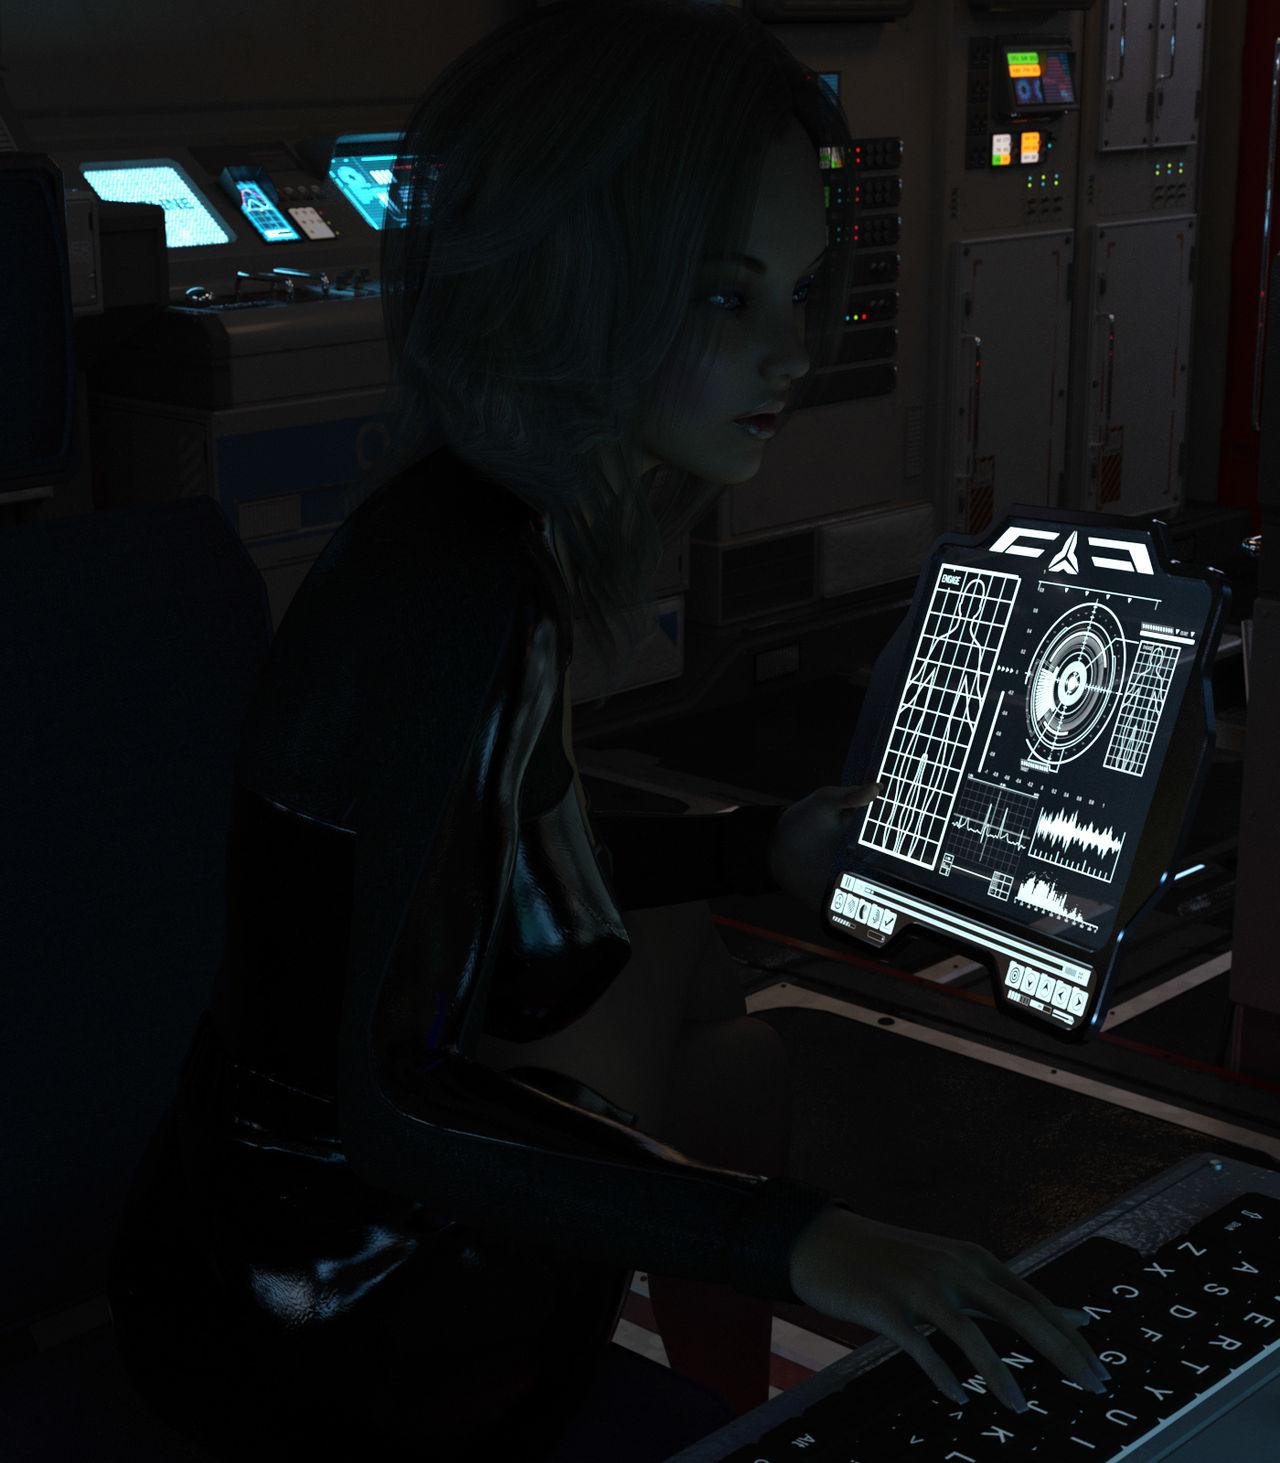 Hình ảnh 001 in Captain Anger